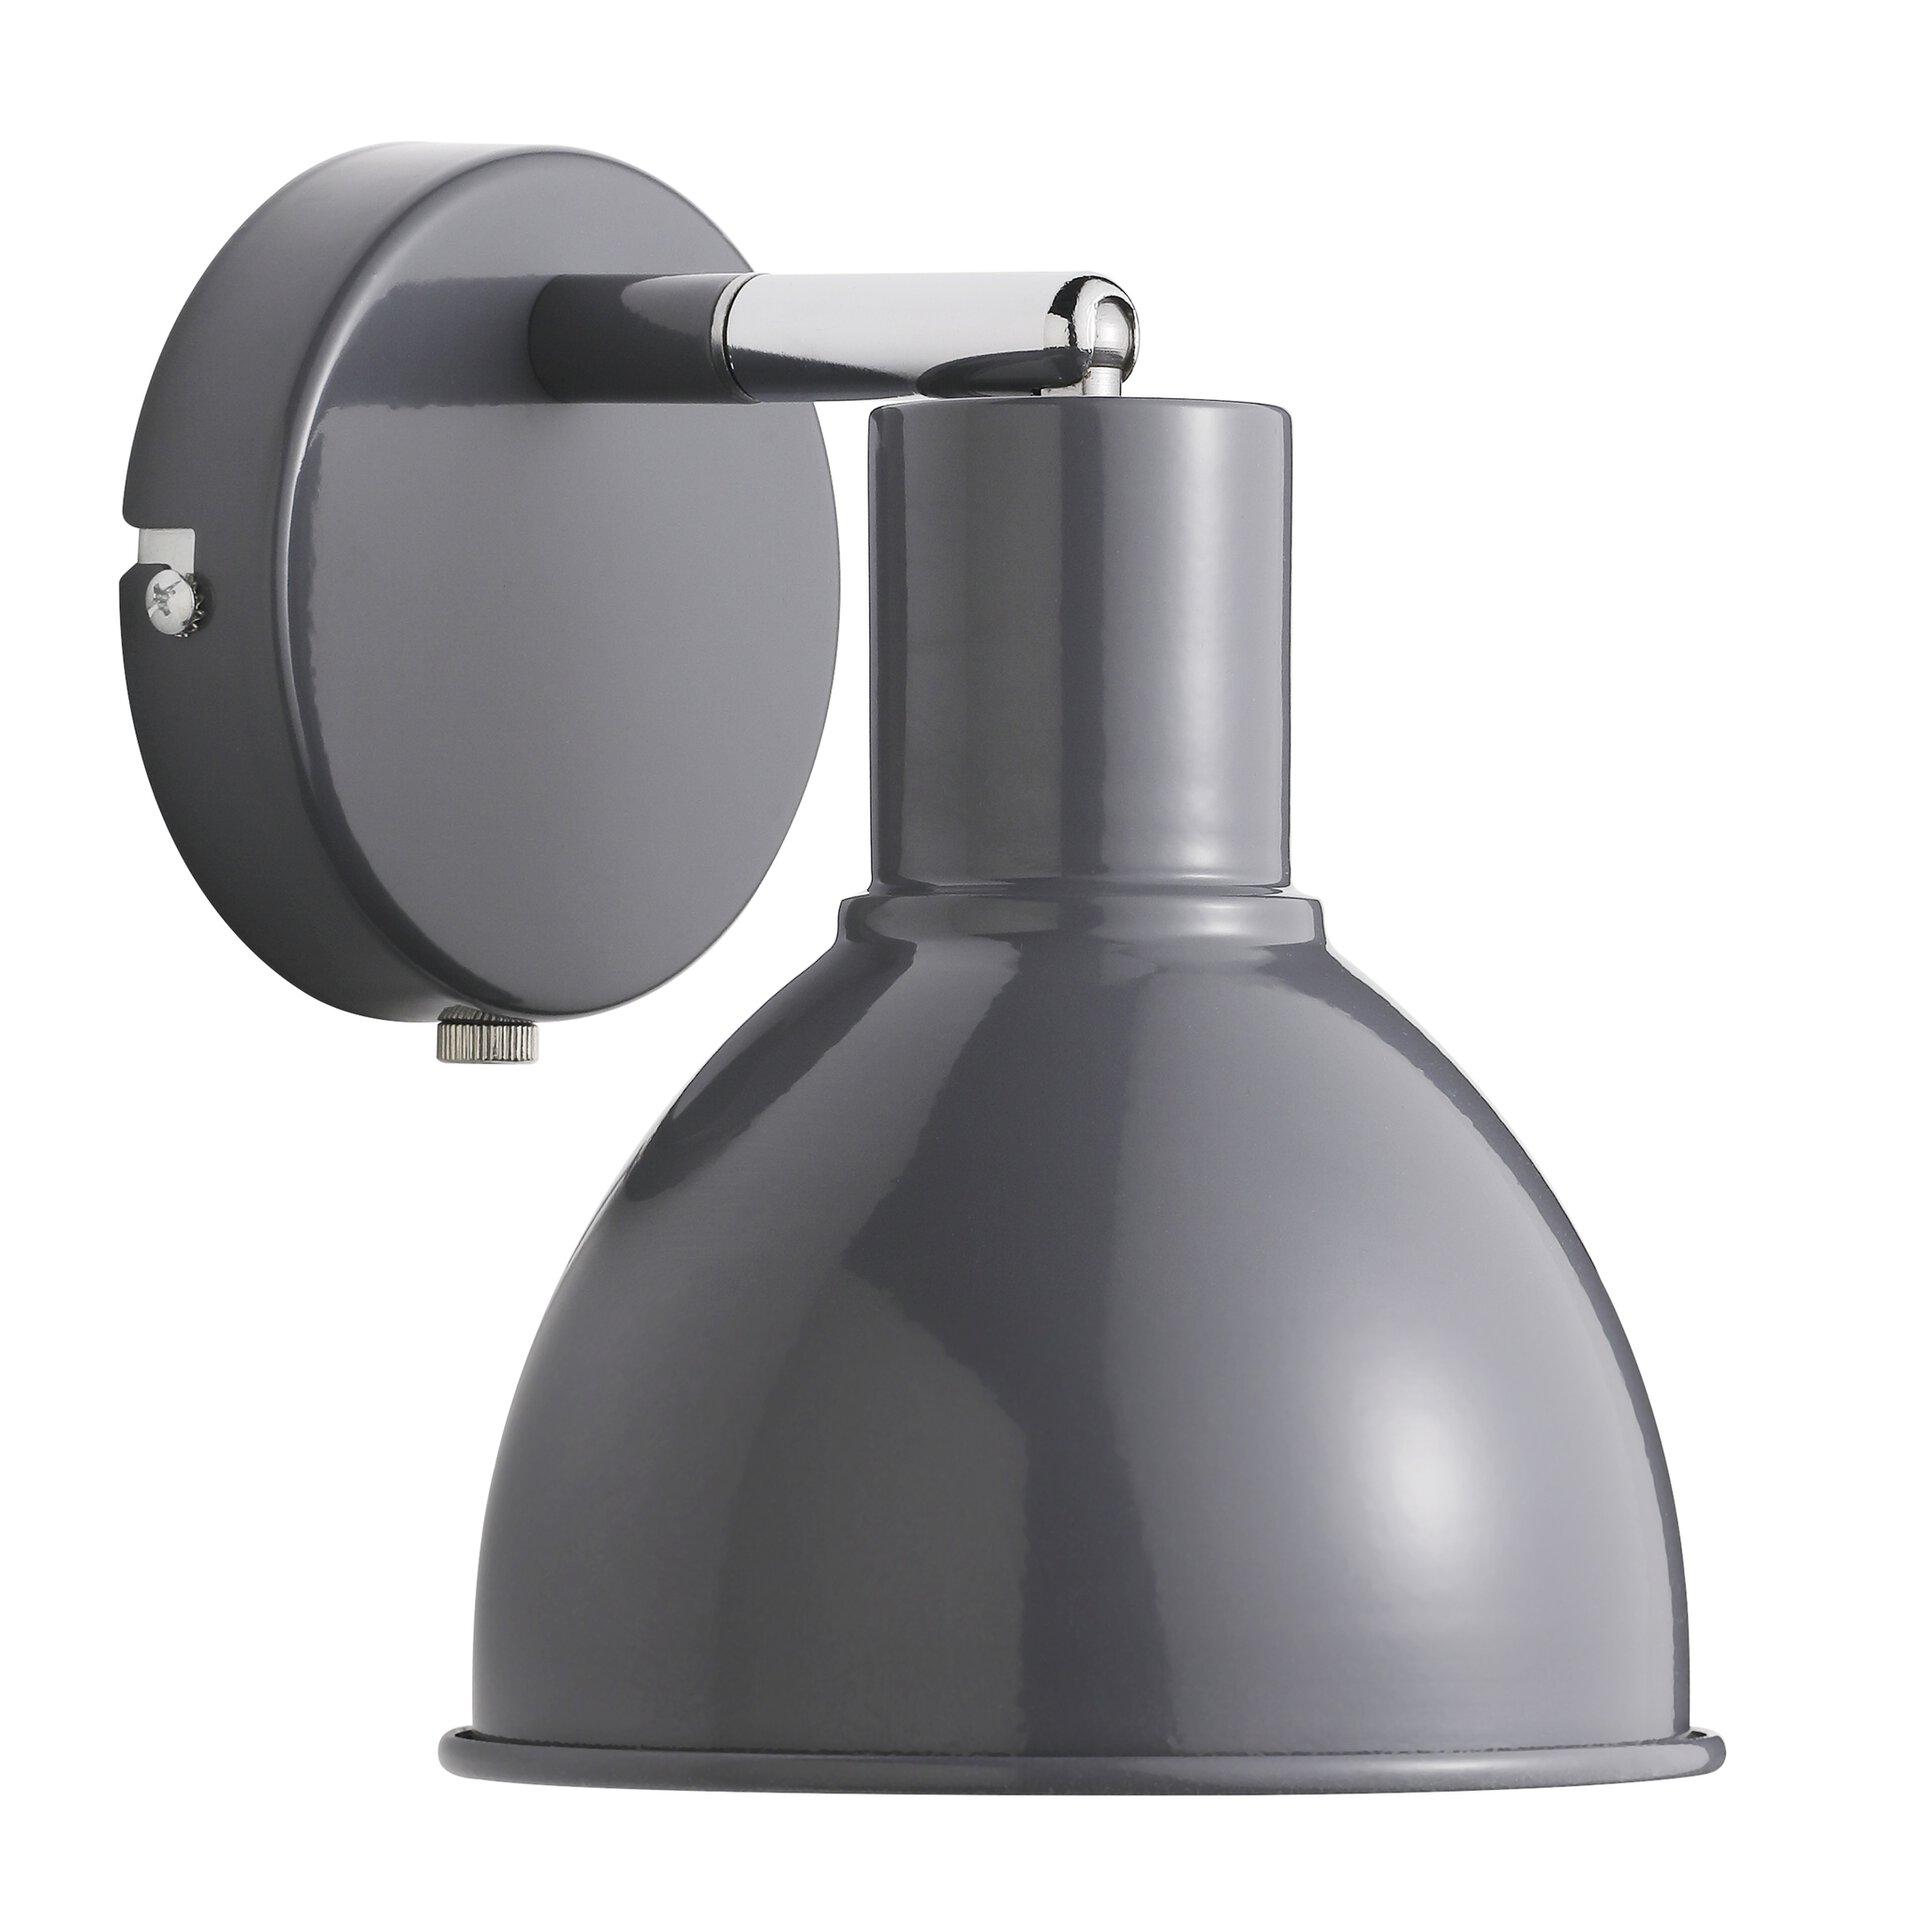 Wandleuchte POP Nordlux Metall grau 16 x 20 x 16 cm